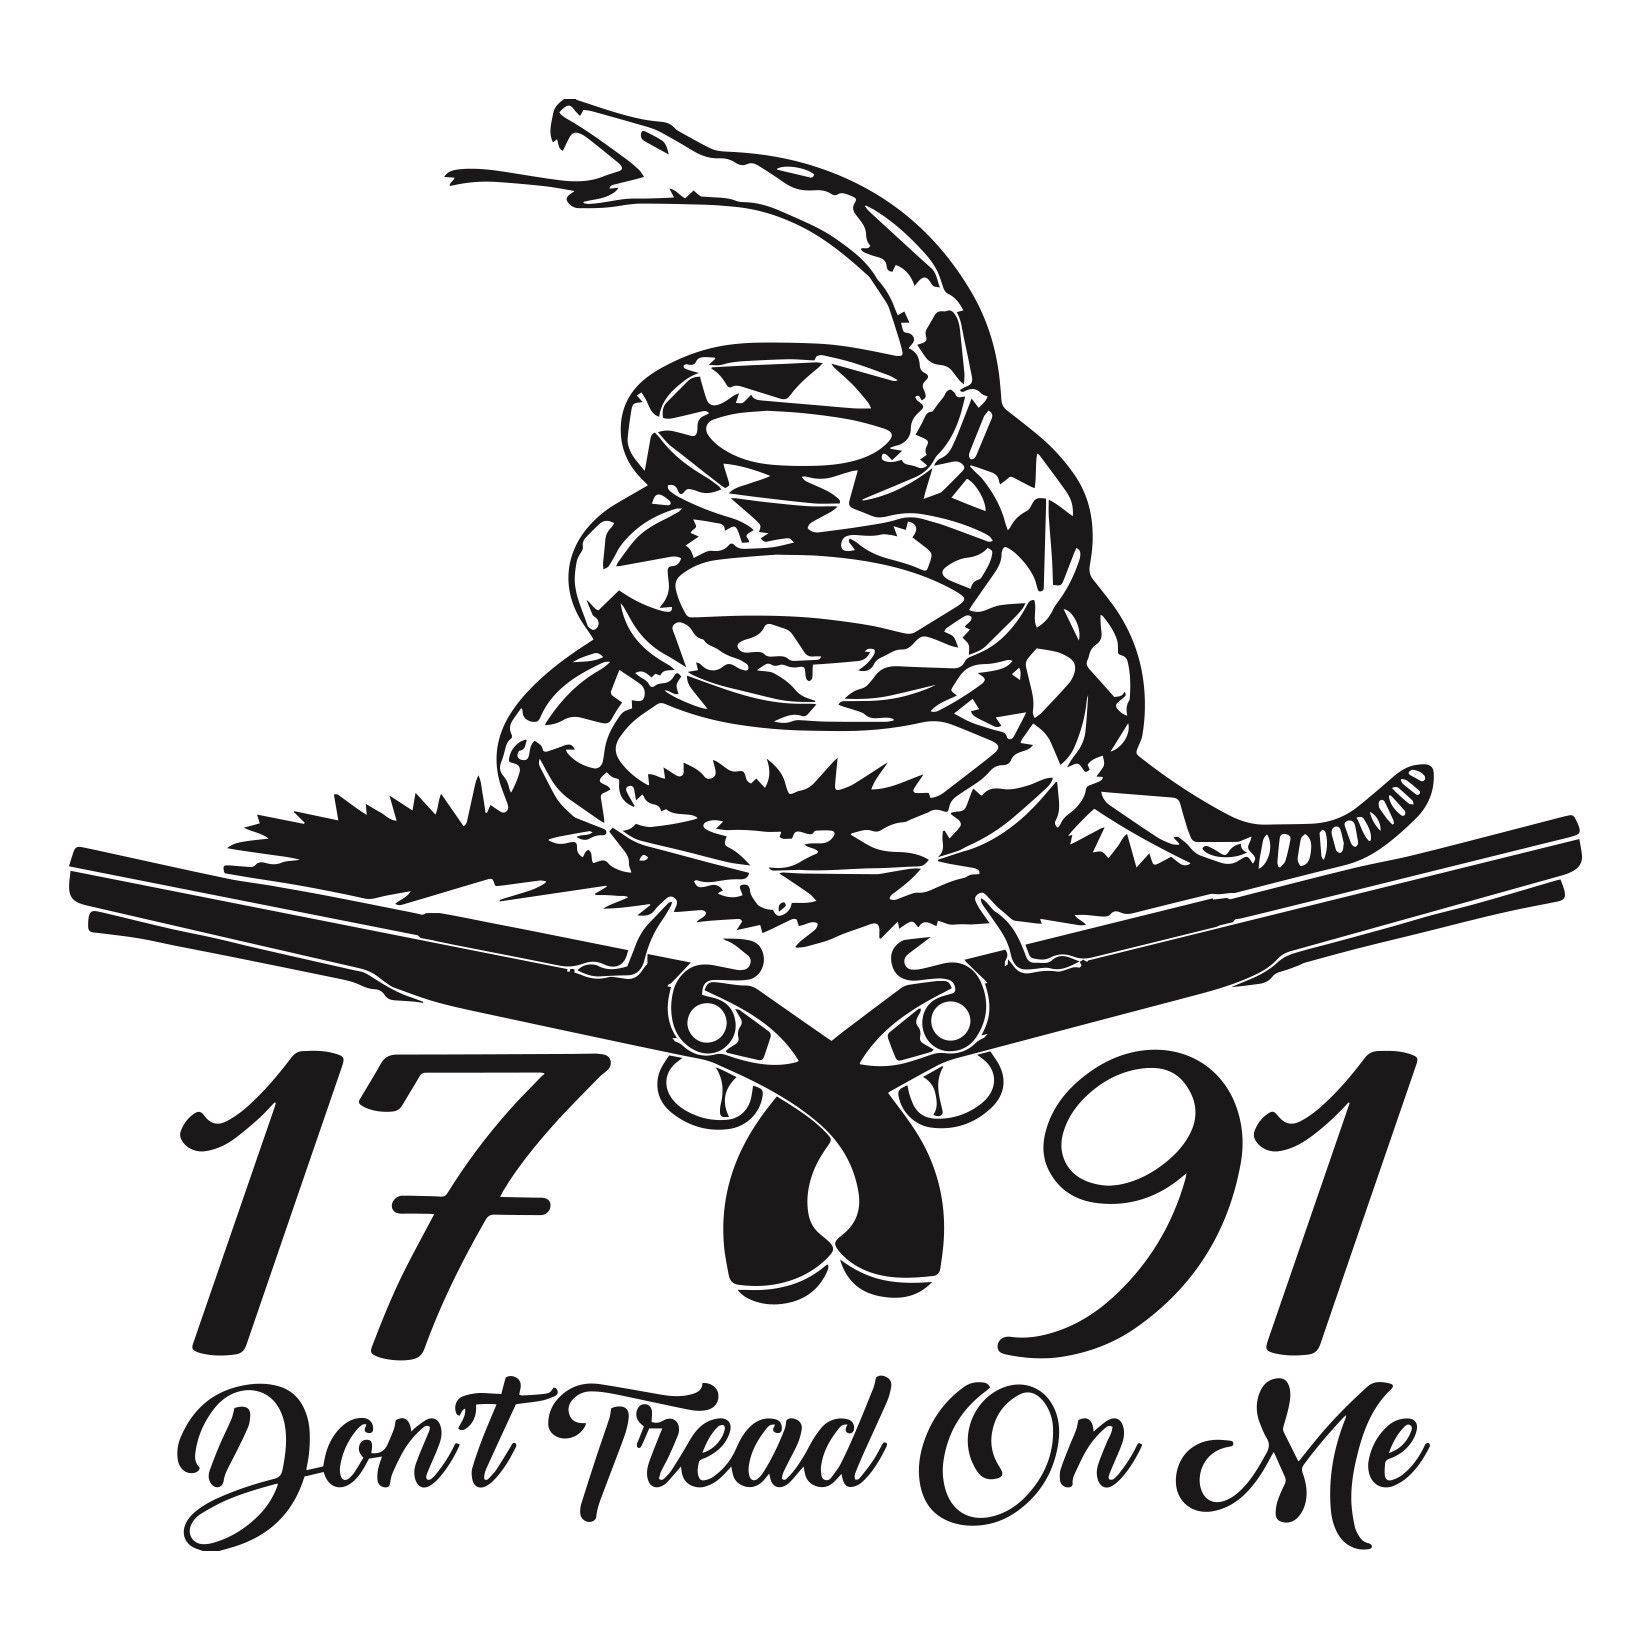 Don T Tread On Me Vinyl Sticker 5 25 X5 25